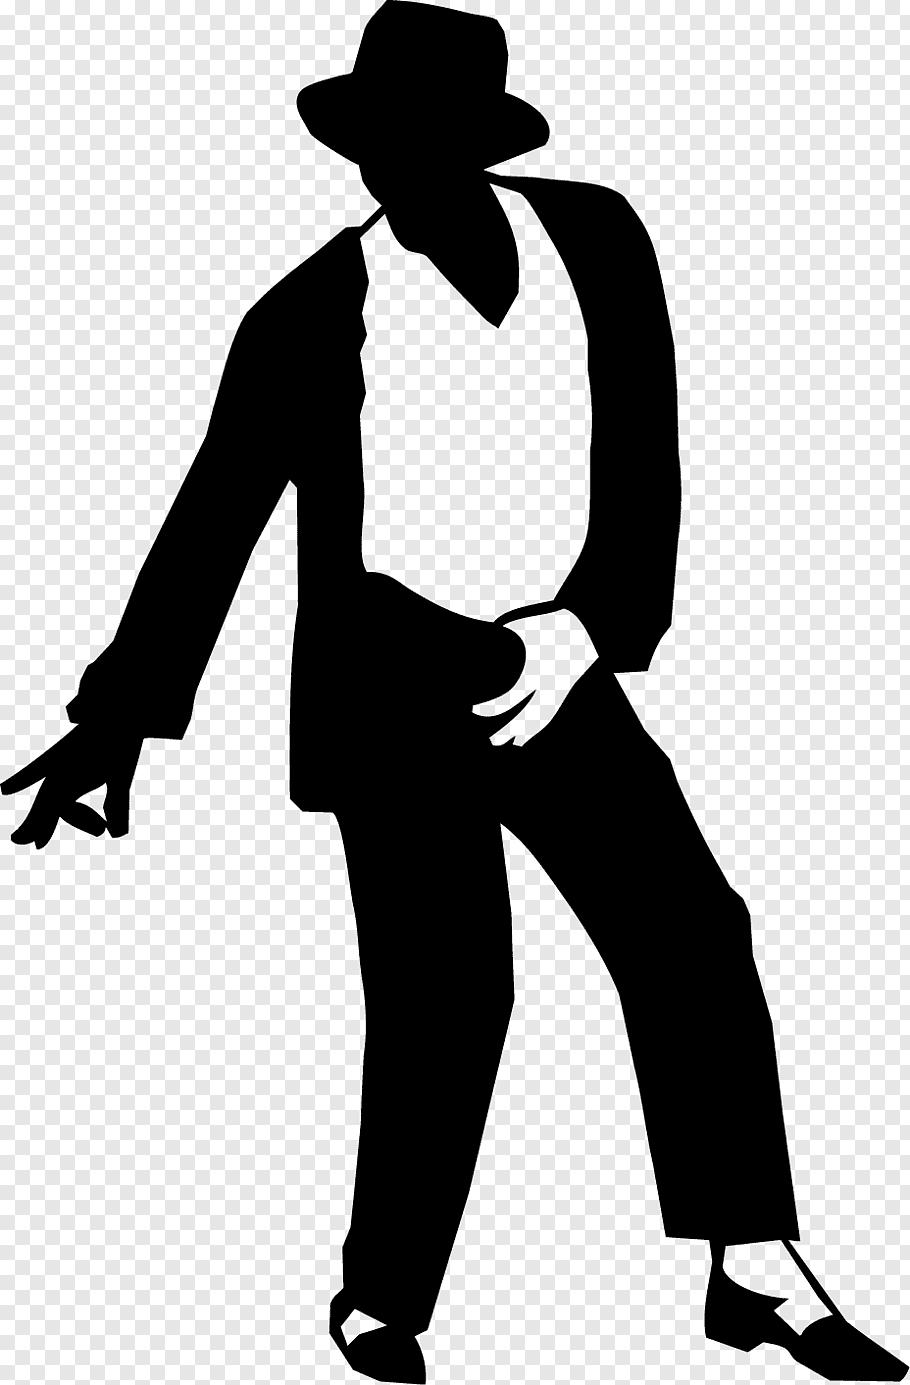 Moonwalk Silhouette Sticker Decal, Michael Jackson dancing.